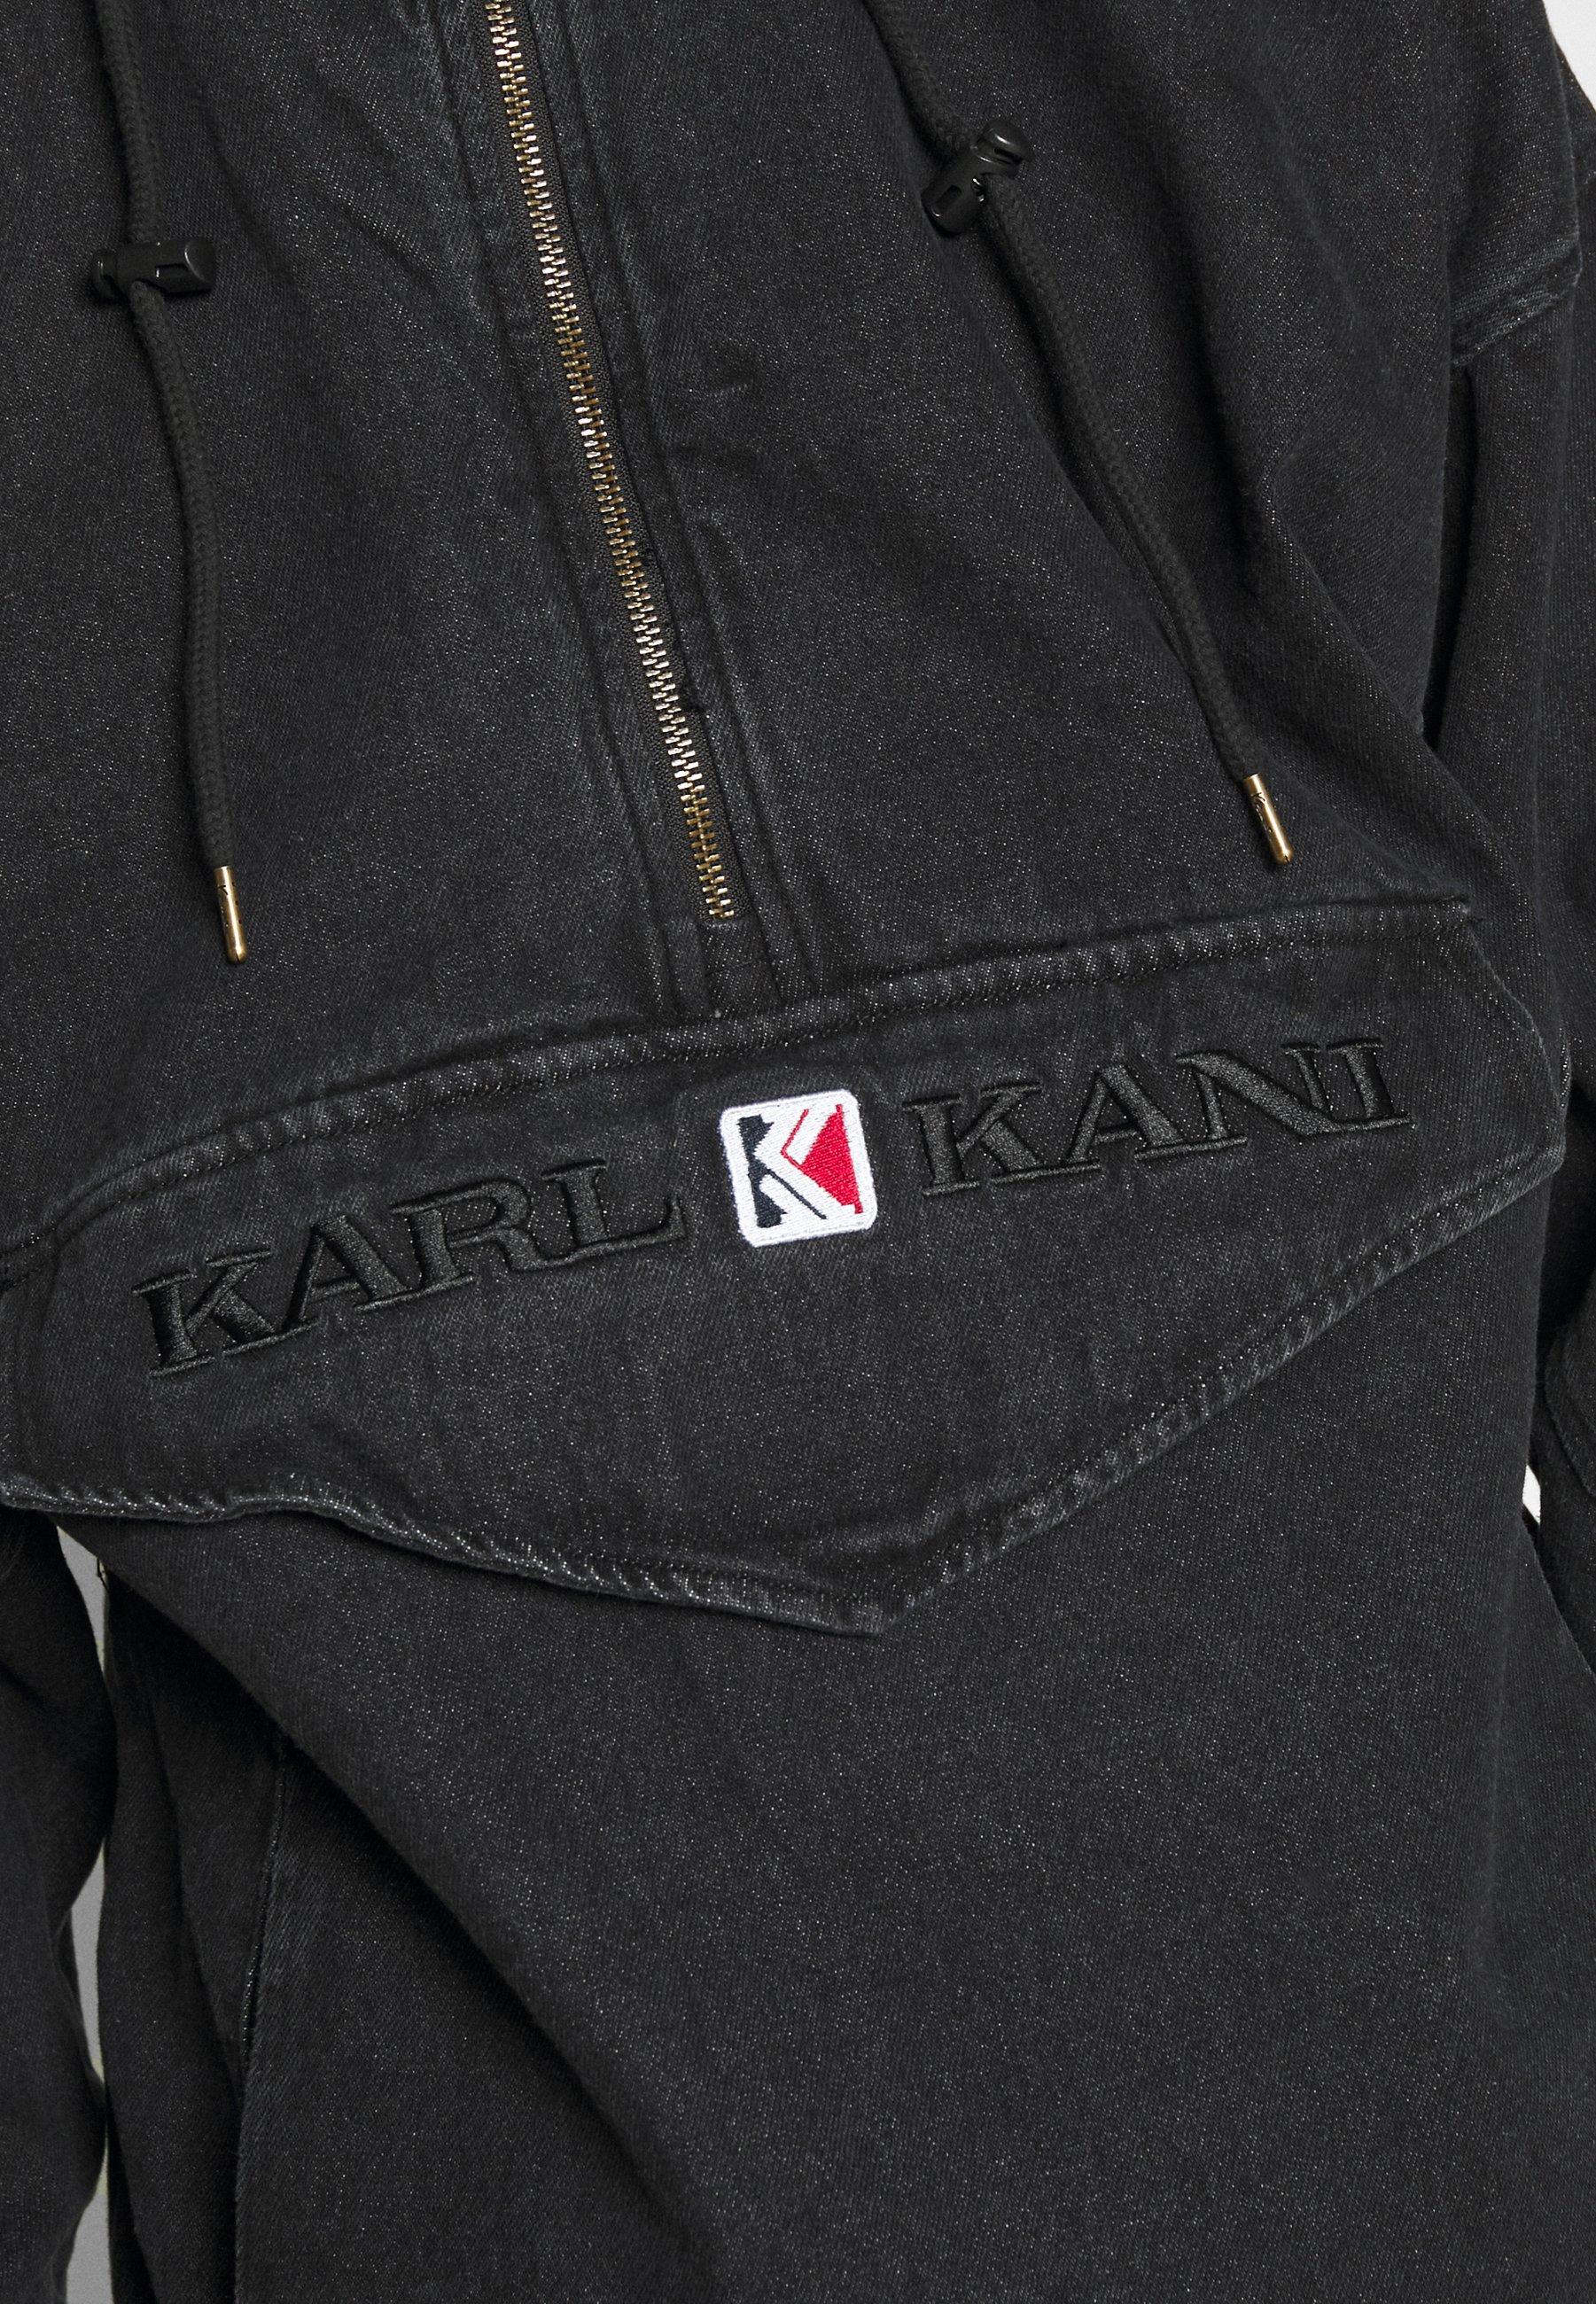 Karl Kani Retro Washed - Windbreaker Black